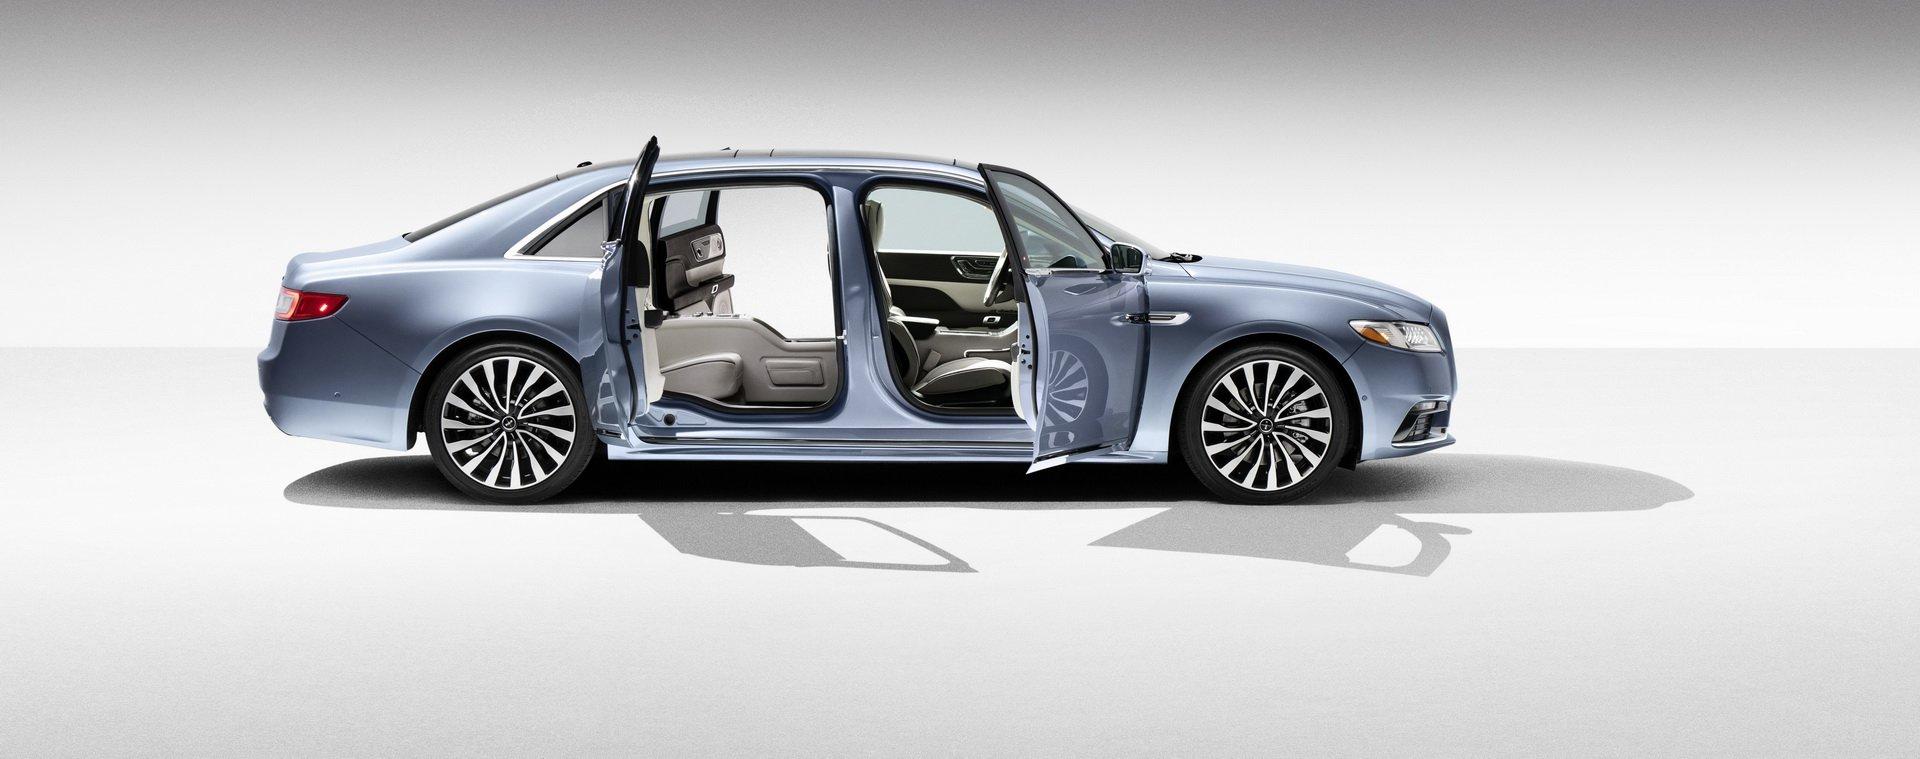 Lincoln Continental Coach Door Edition (47)